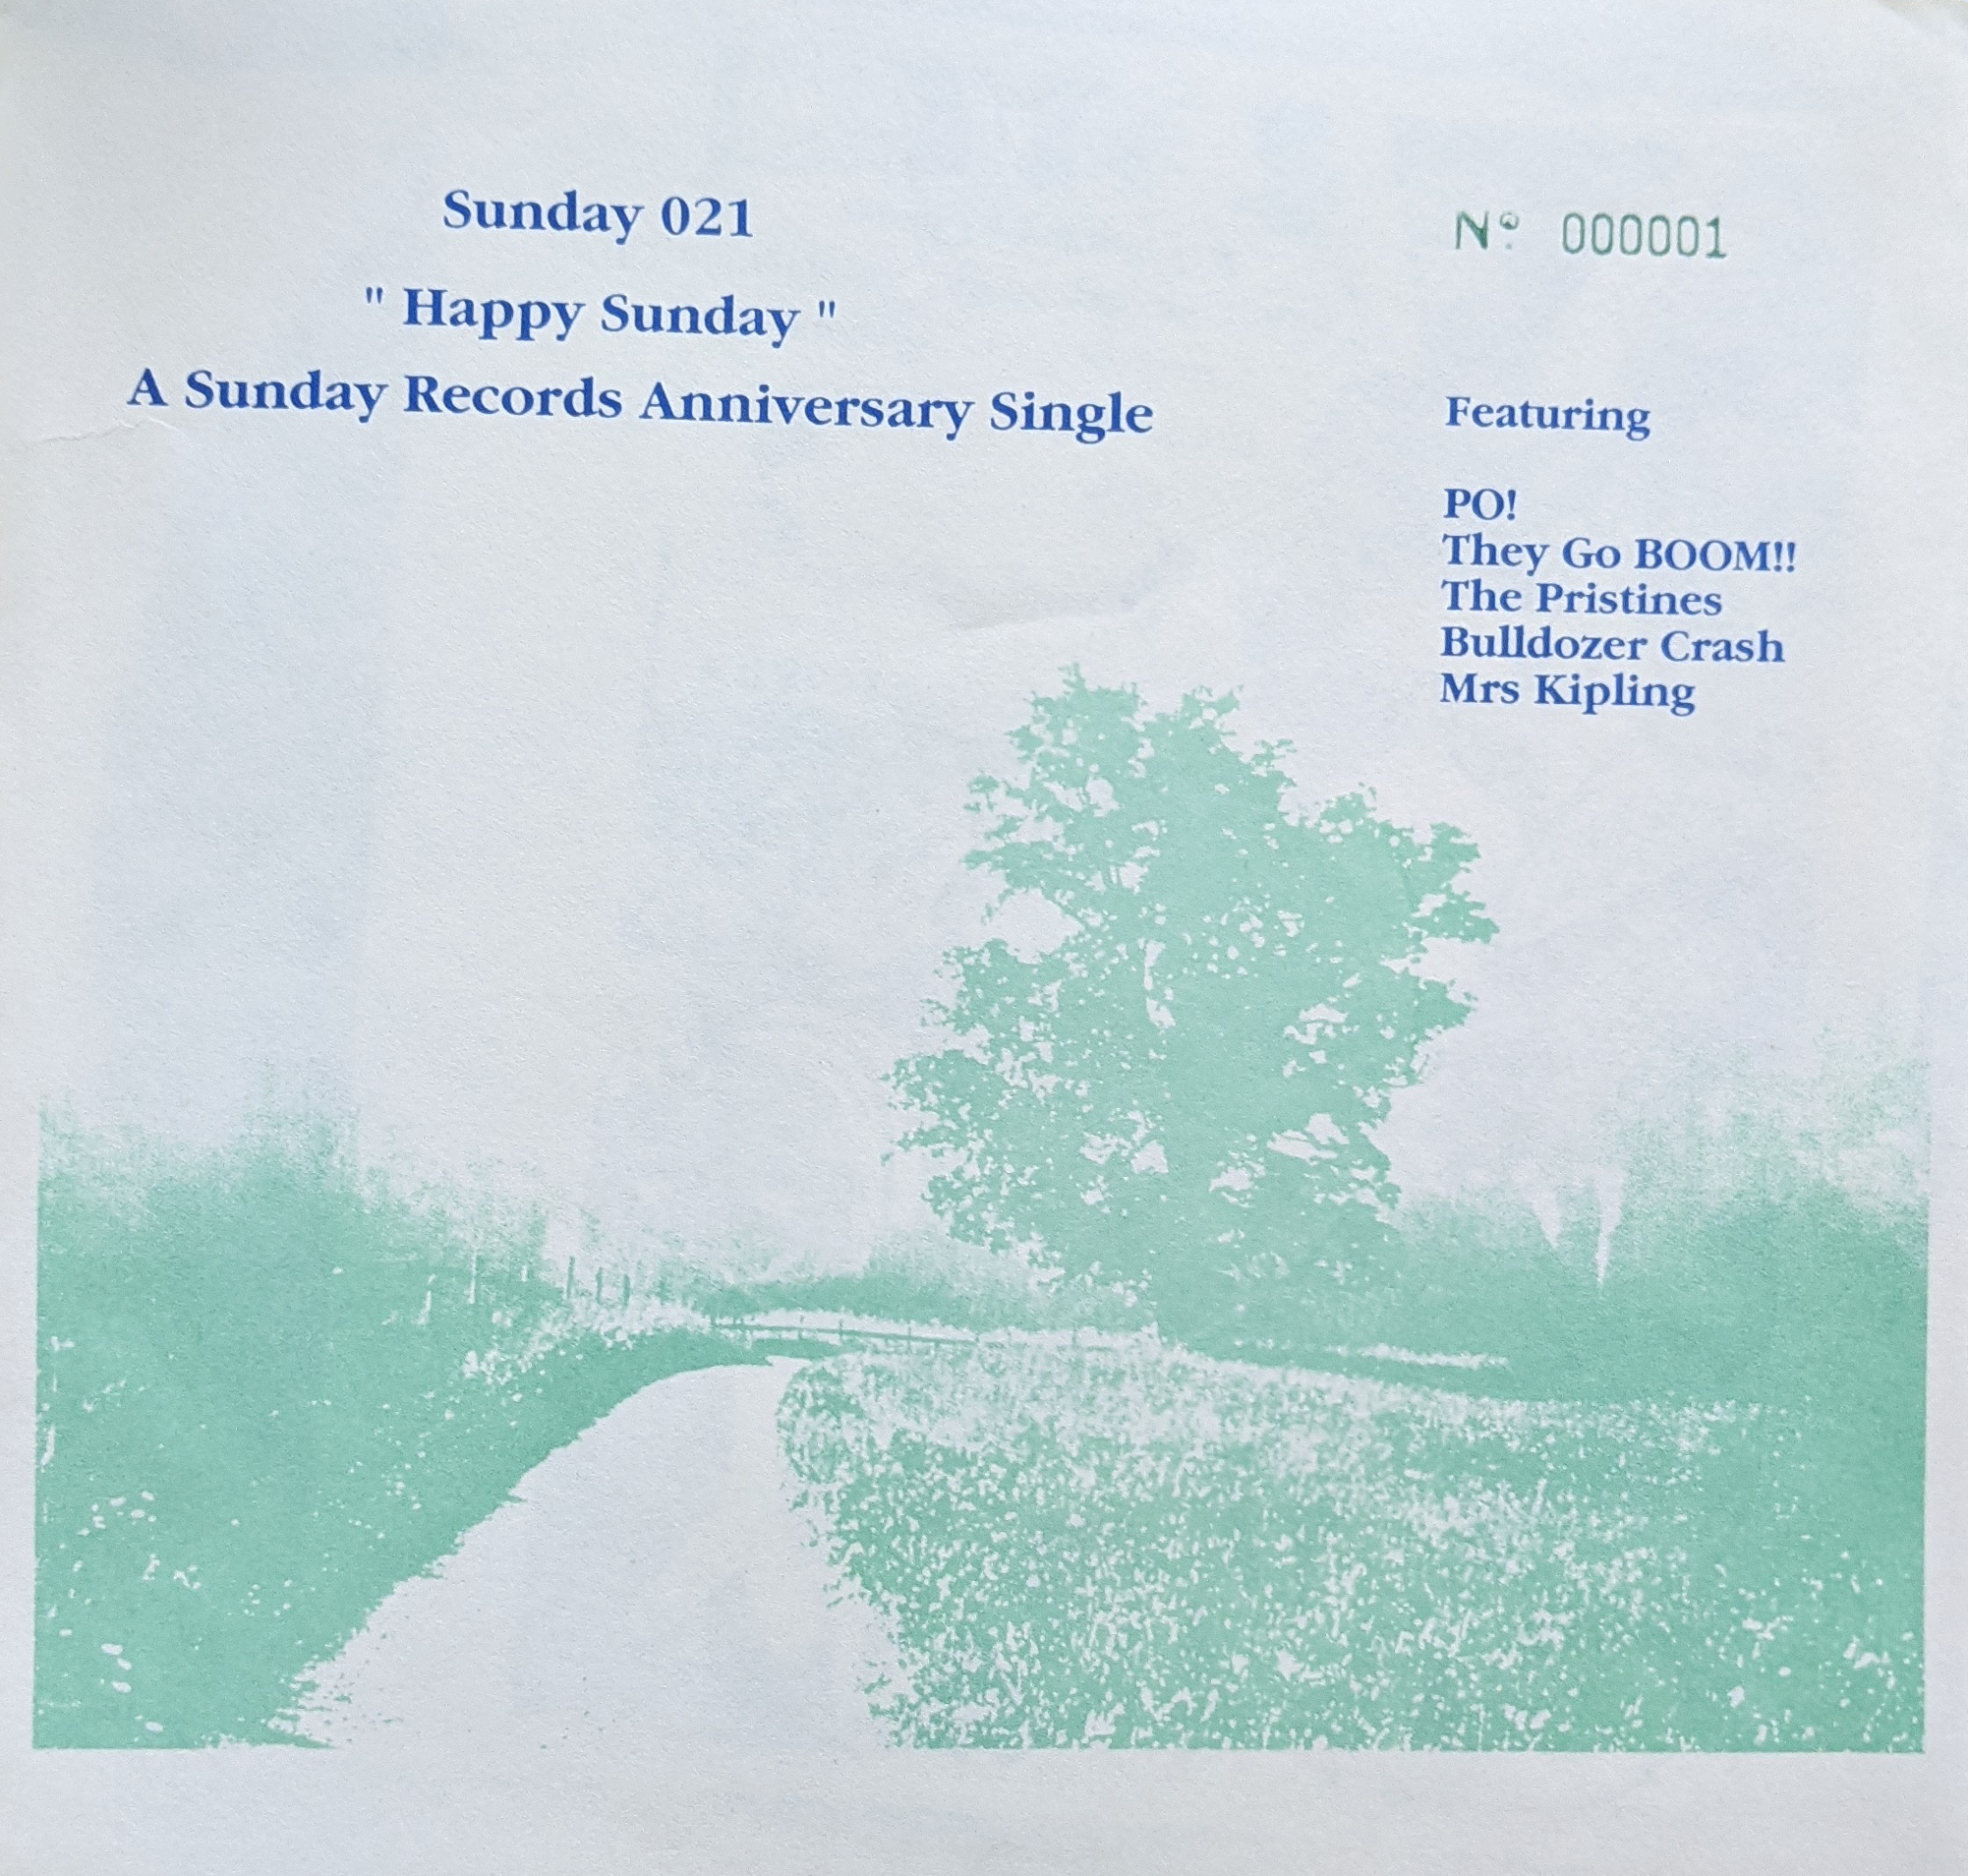 Happy Sunday 9